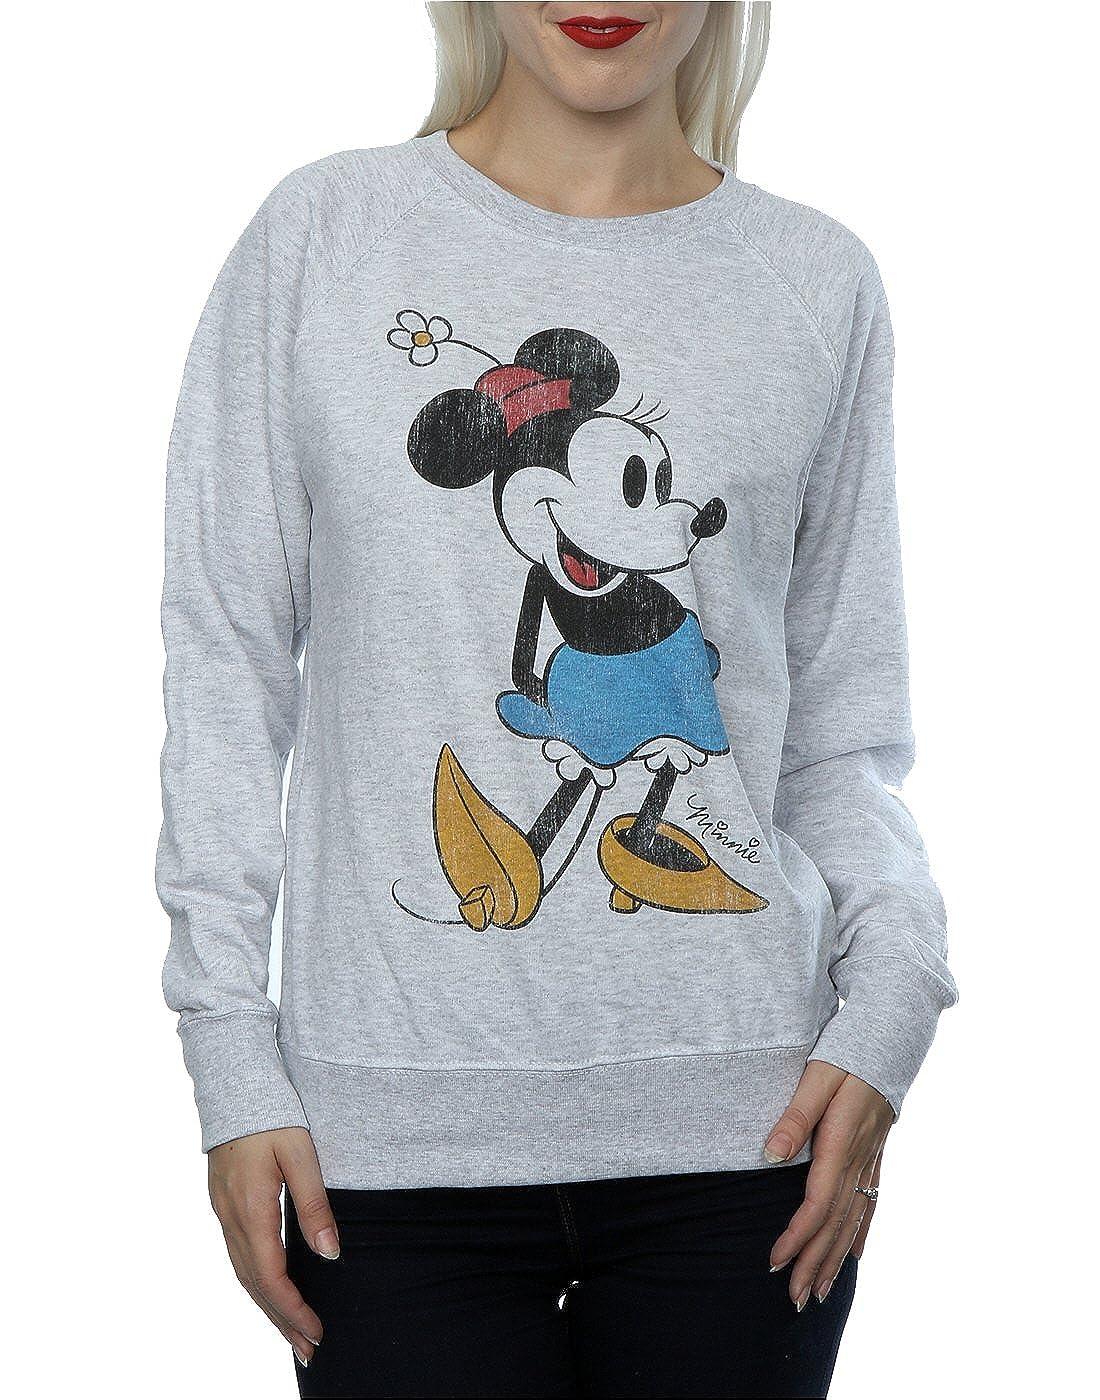 01dd40e16a1 Amazon.com  Disney Women s Classic Minnie Mouse Sweatshirt  Clothing